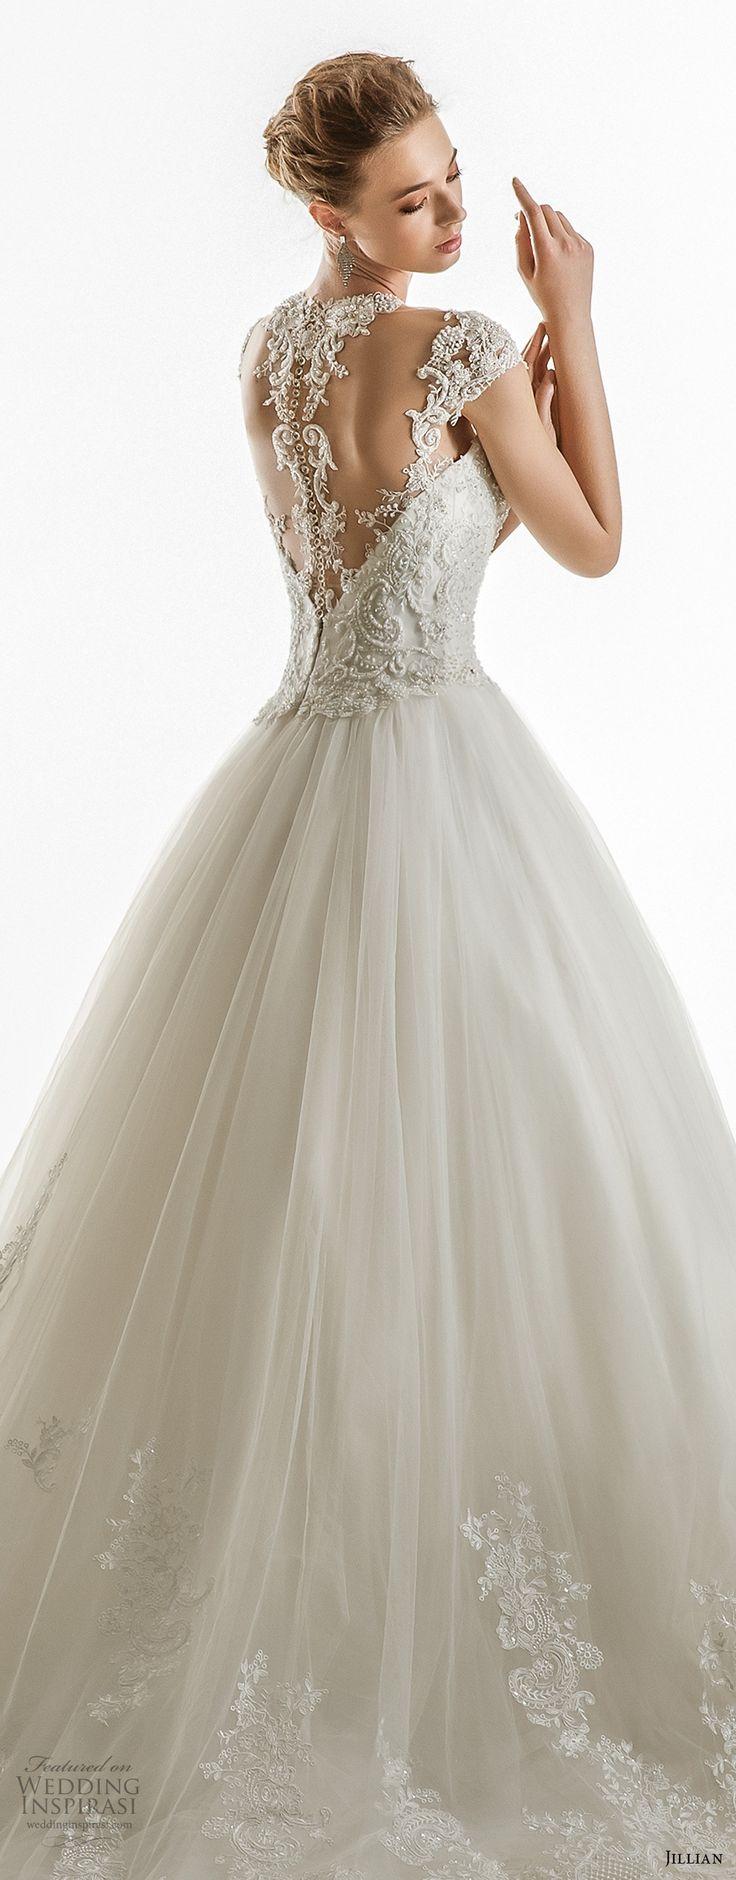 jillian 2018 bridal cap sleeves illusion jewel sweetheart neckline heavily embellished princess ball gown wedding dress sheer lace back chapel train (17) zbv -- Jillian 2018 Wedding Dresses